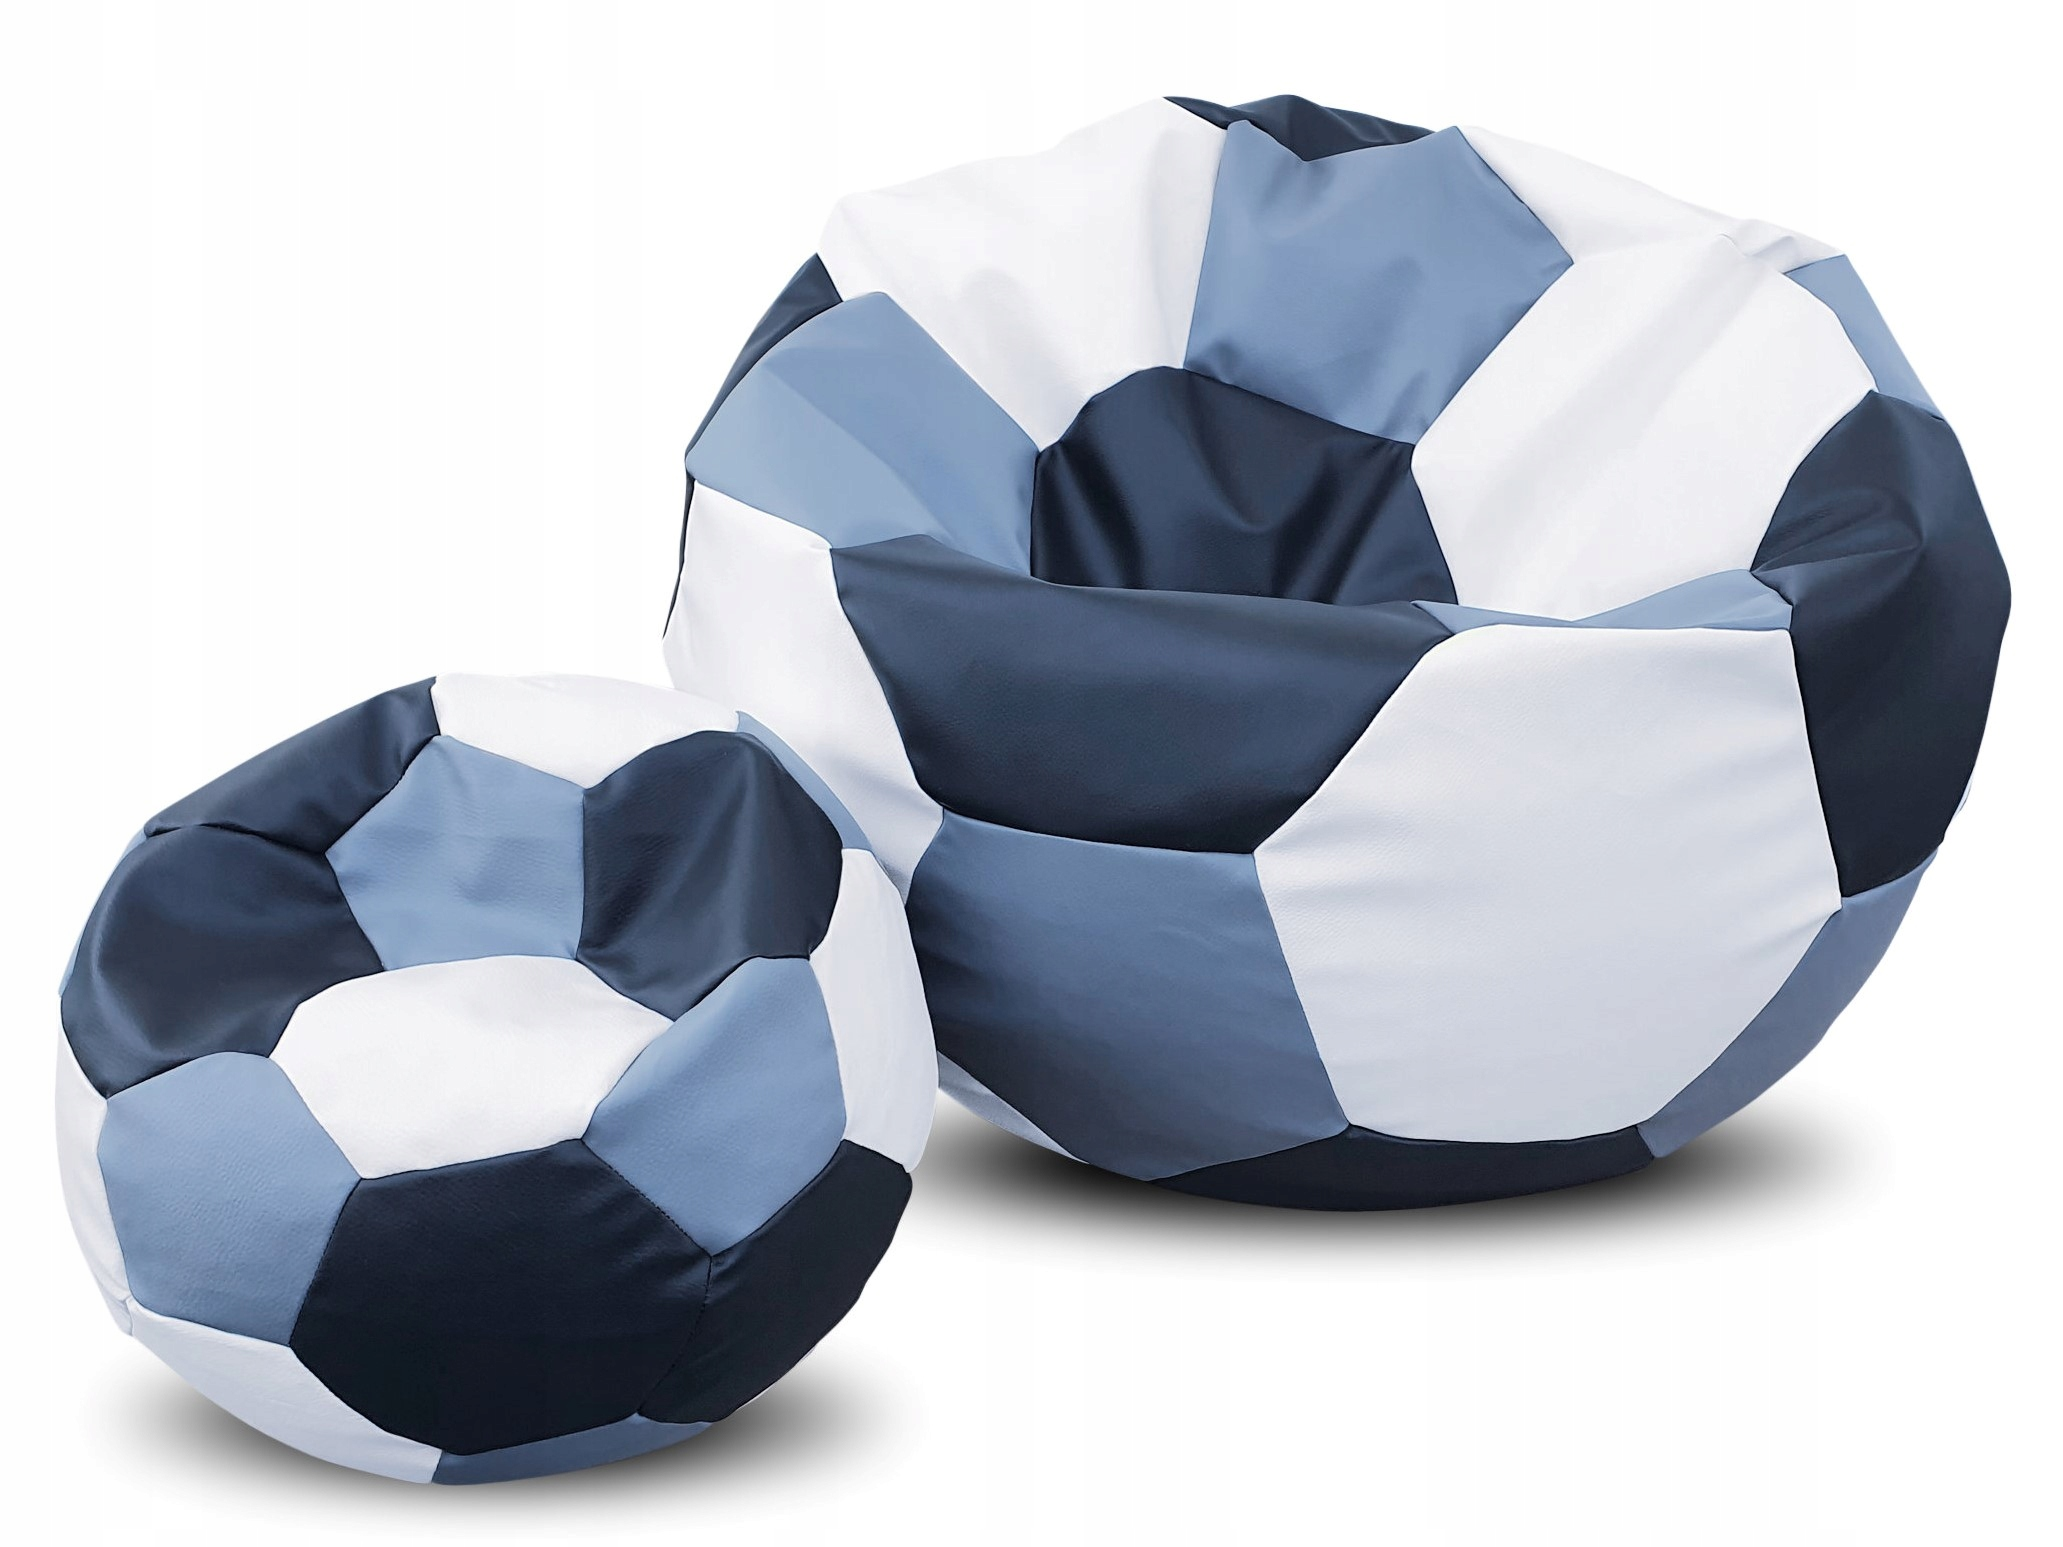 PUFF BALL XXXL PUFF BAG BALL SEAT + БЕСПЛАТНО